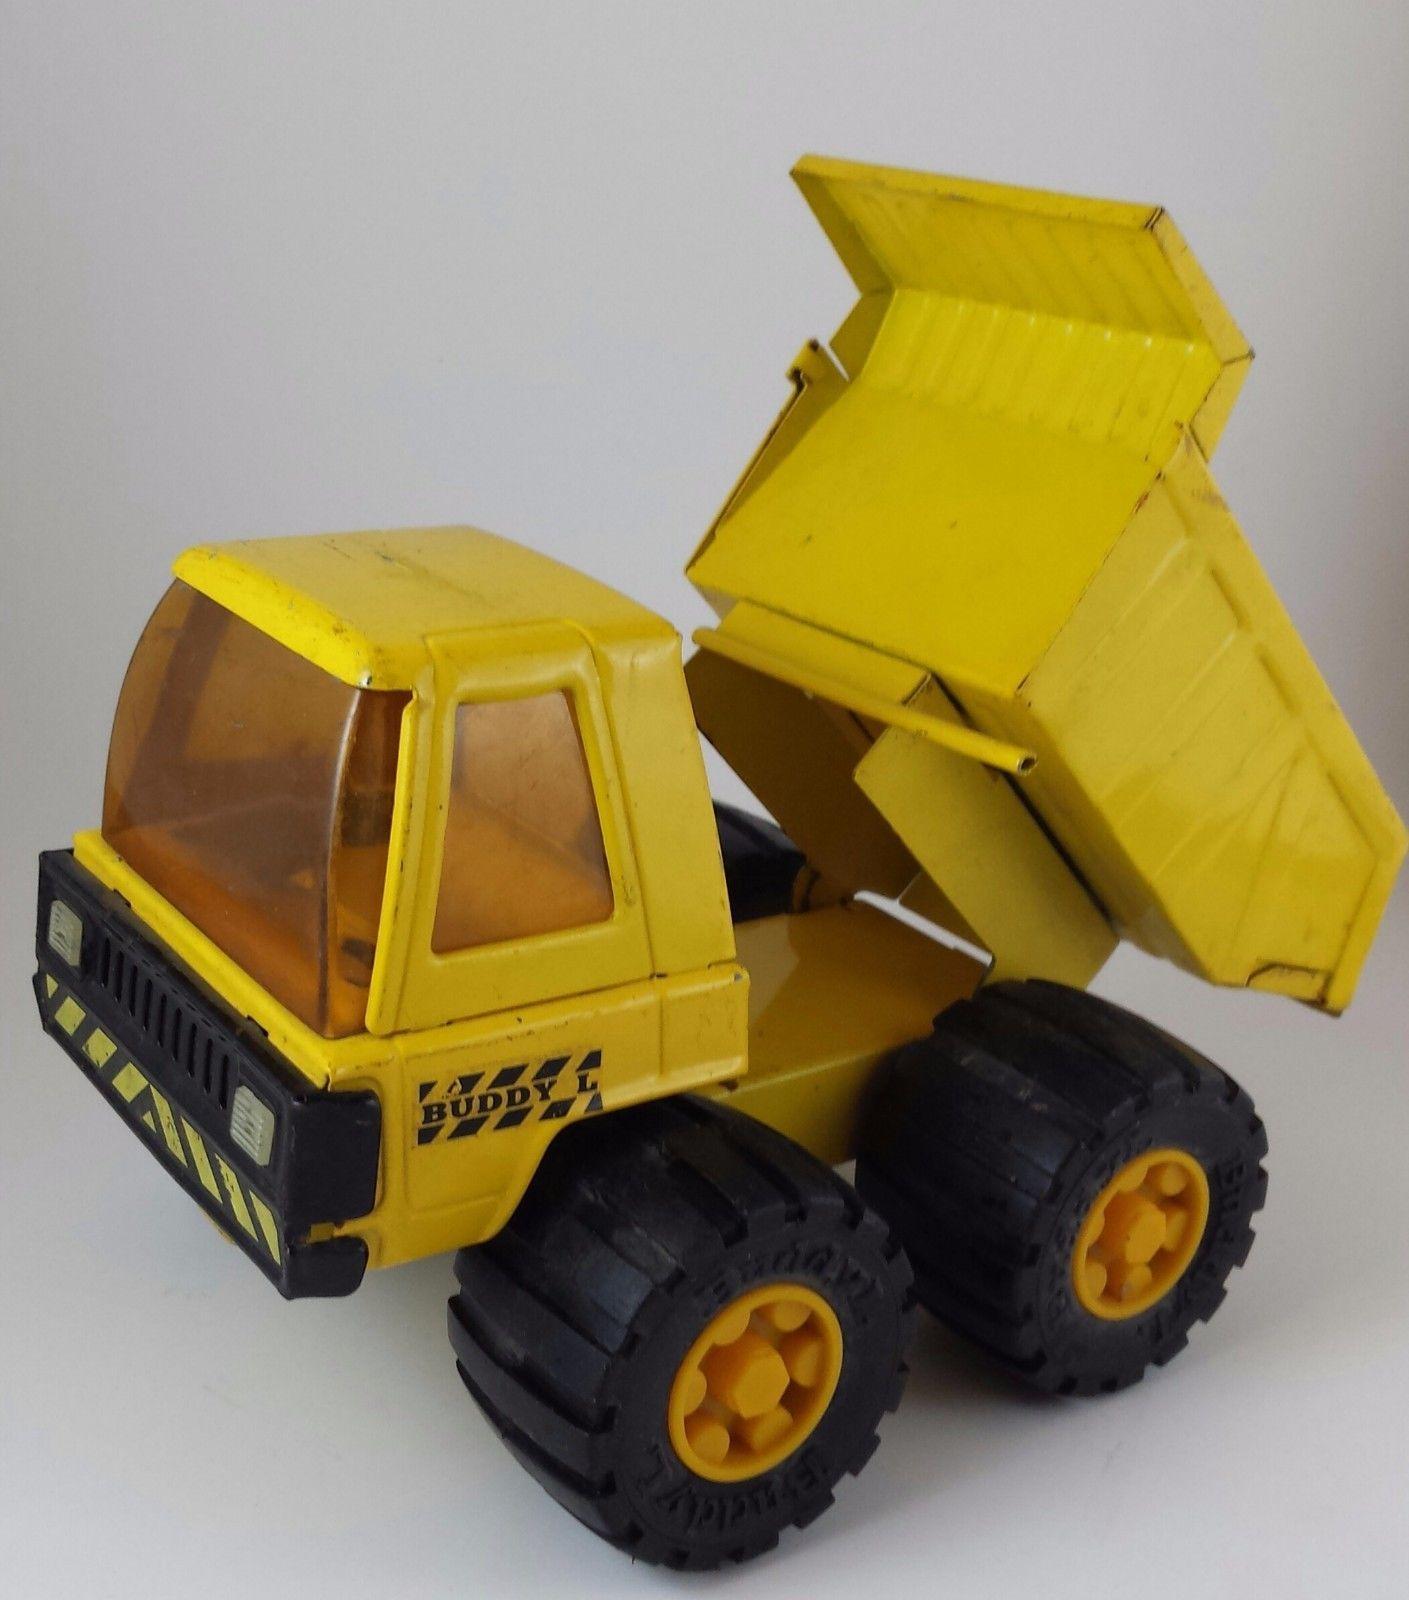 Vintage Buddy L Dump Truck Yellow Japan | eBay | TOYS-2 | Dump